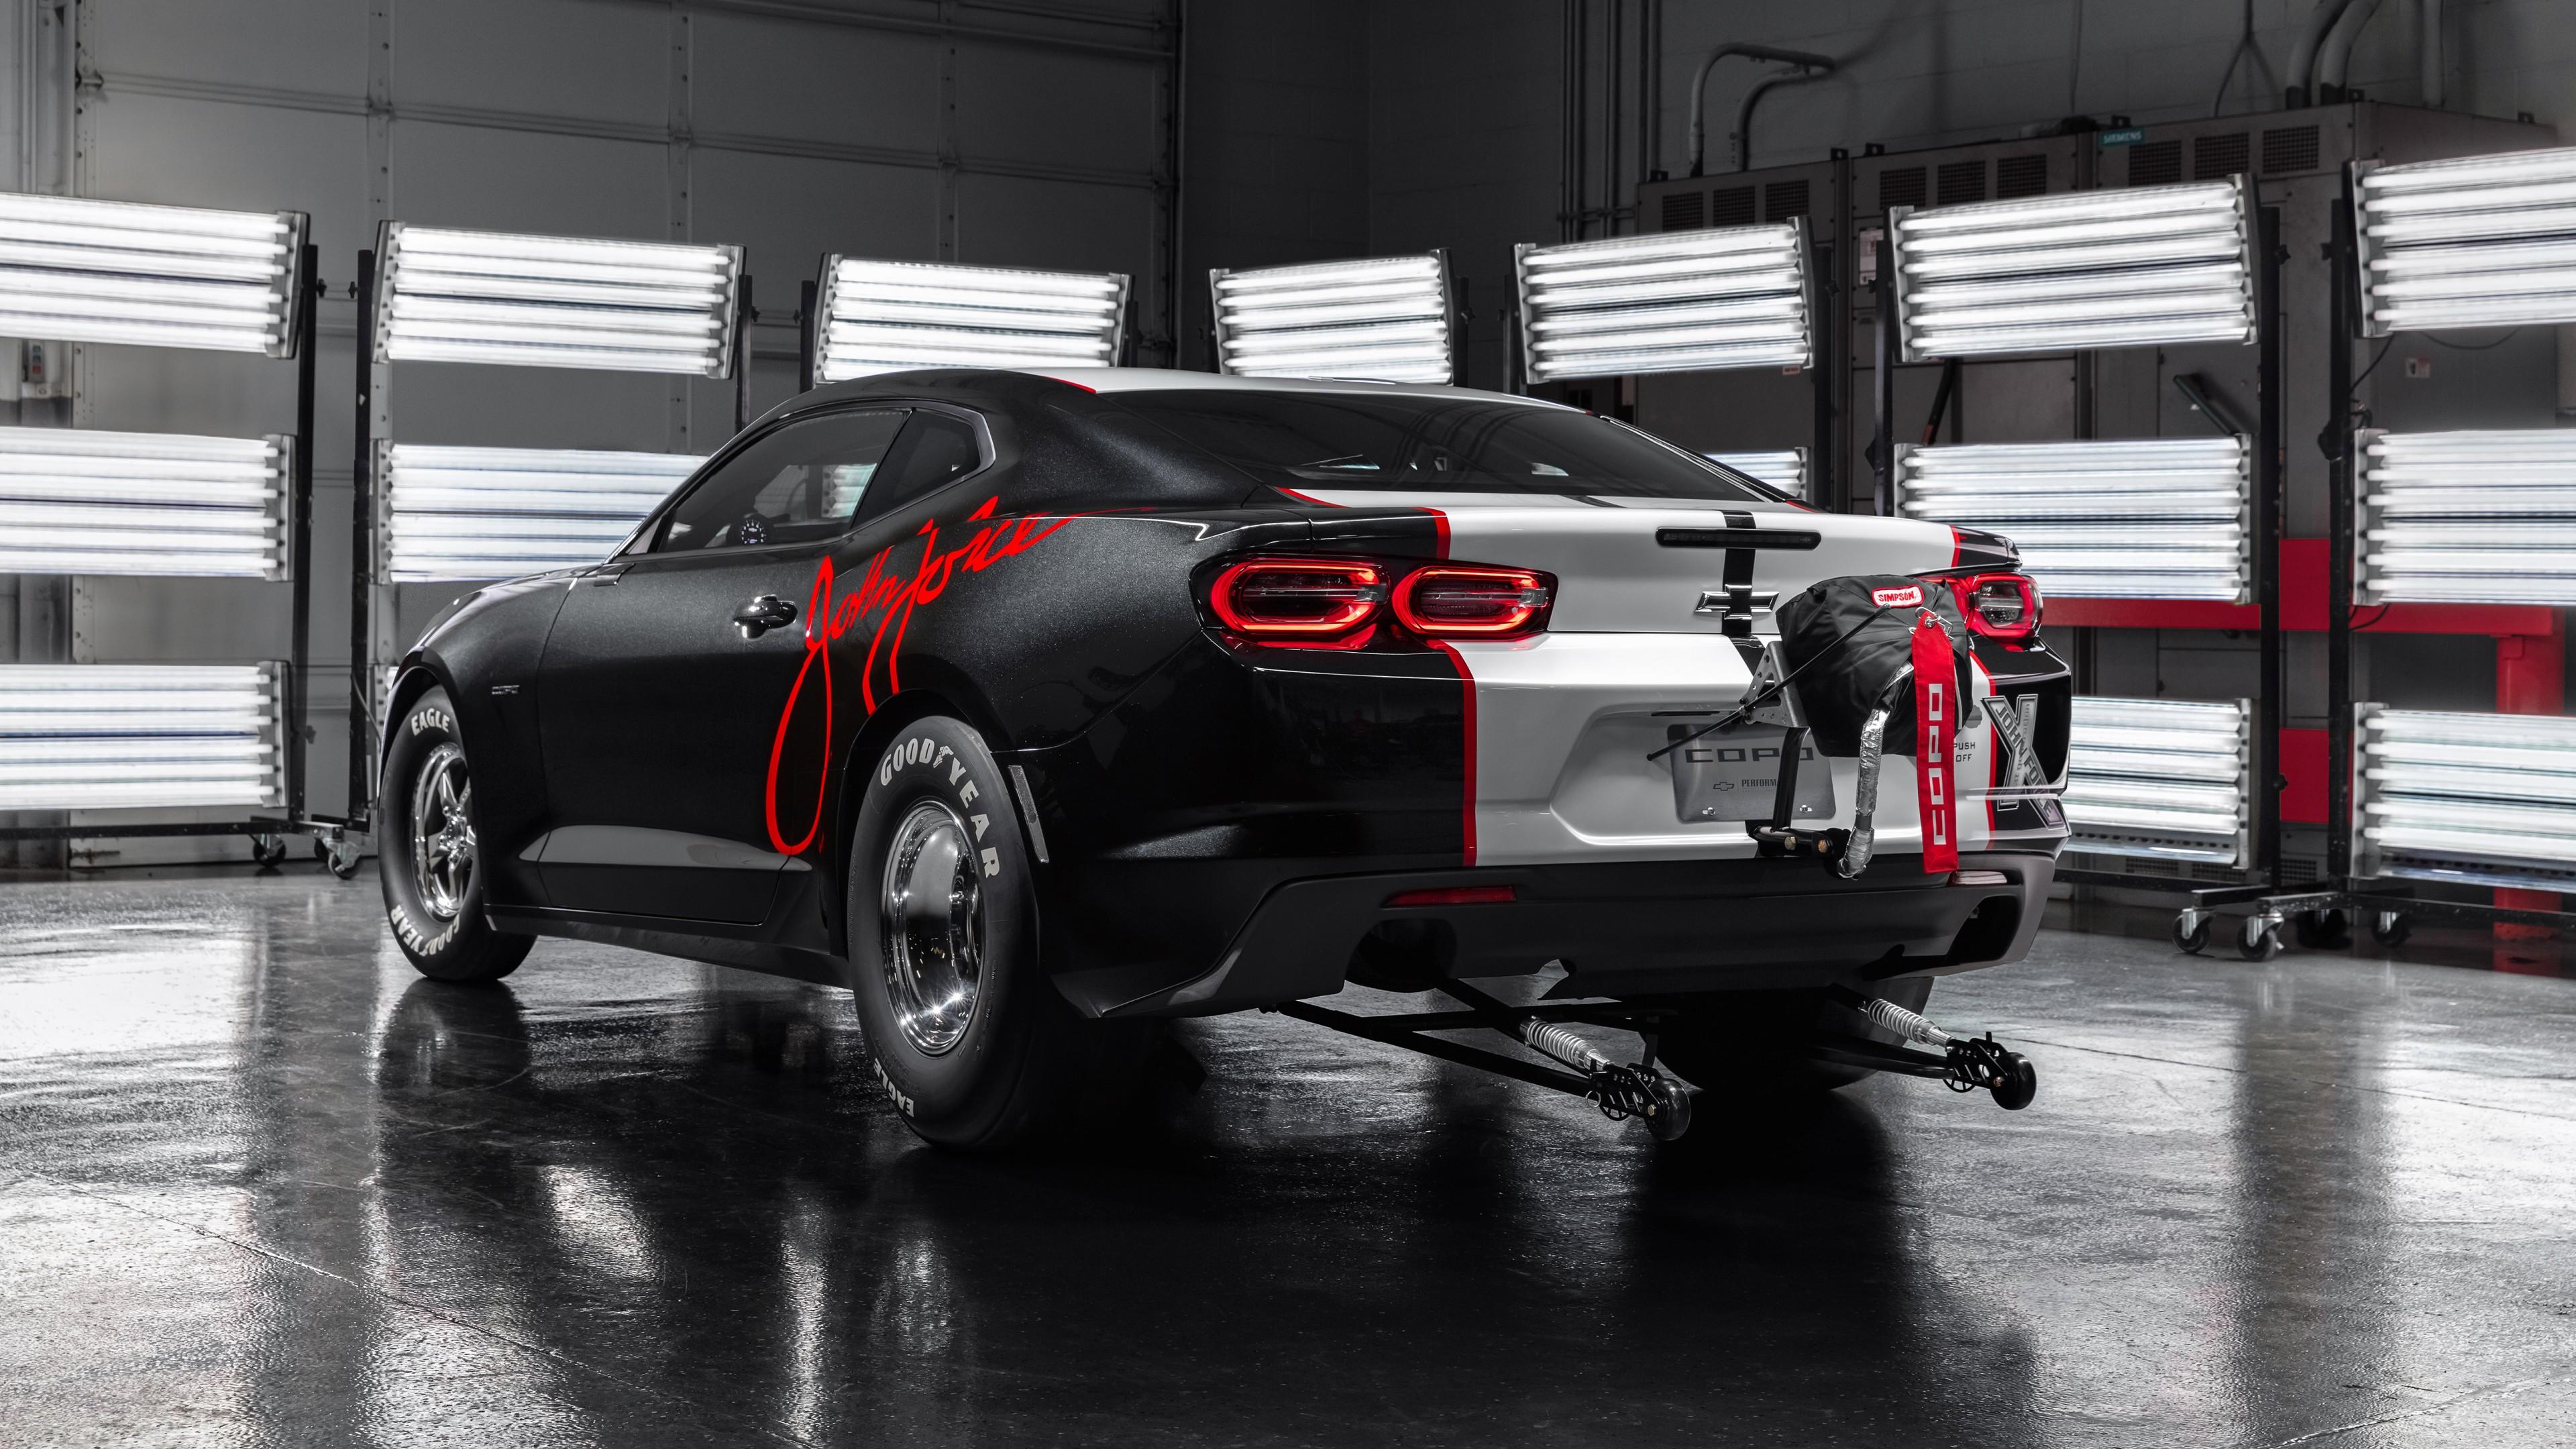 2020 Chevrolet COPO Camaro John Force Edition 4K 3 ...